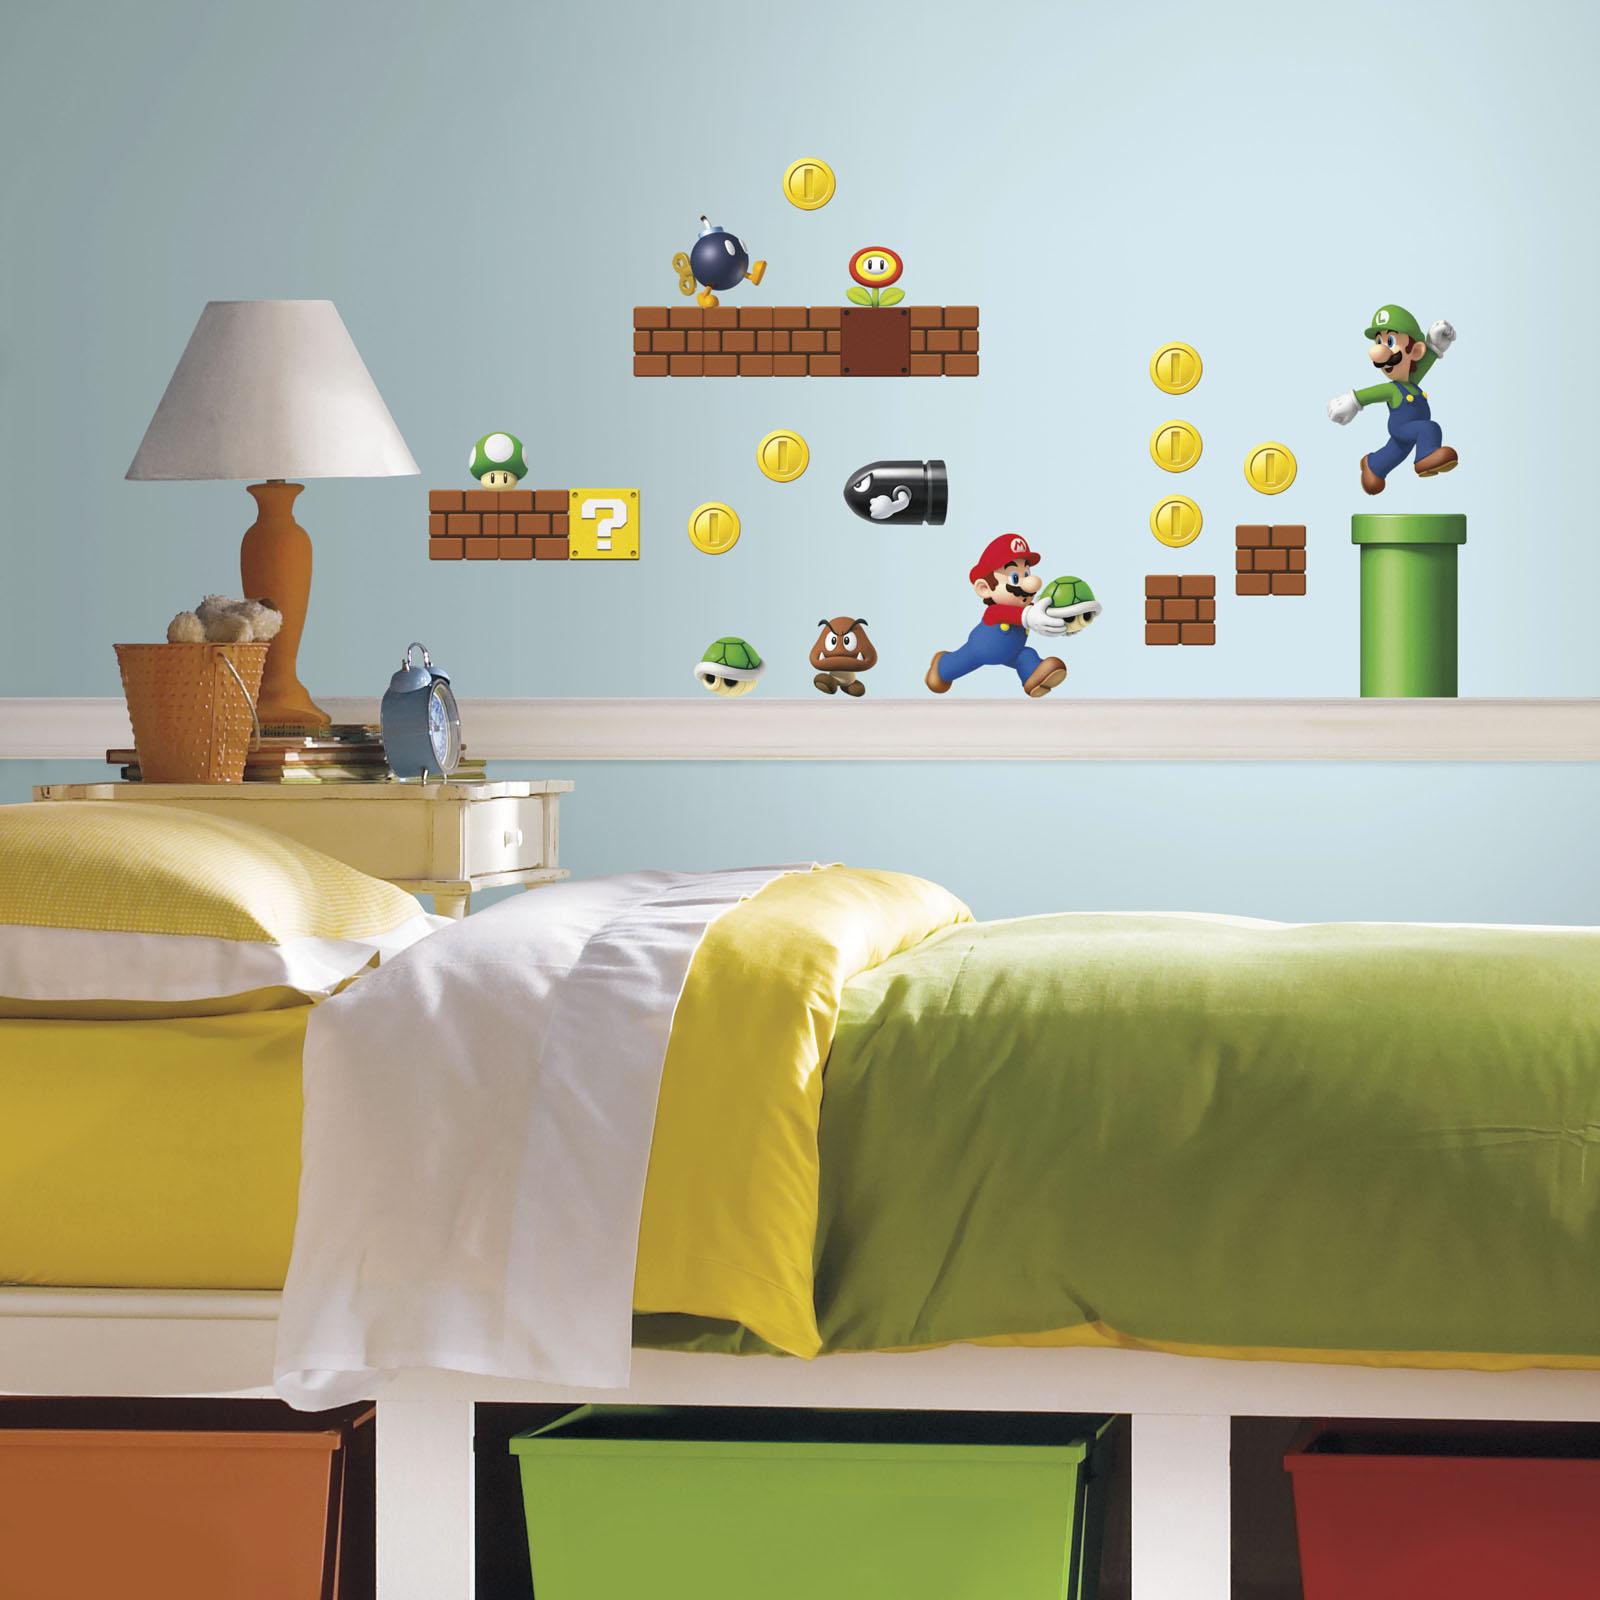 Super Mario Bedroom Roommates Nintendo Super Mario Build A Scene Peel And Stick Wall